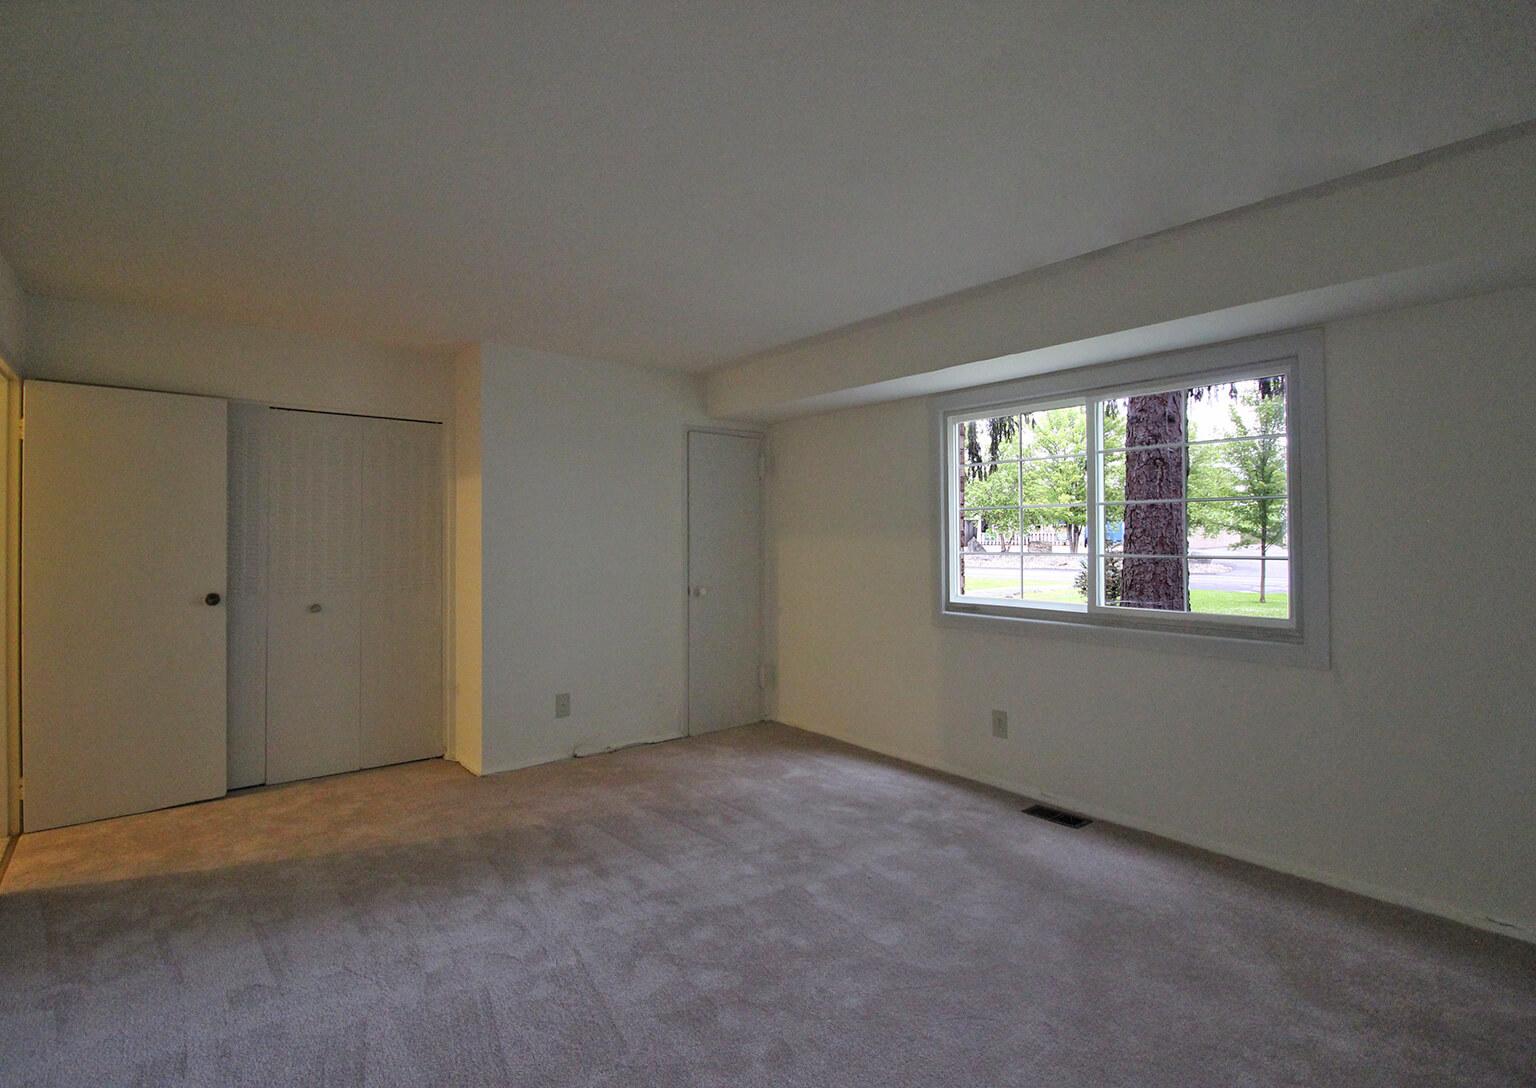 Lake Shore Park Apartments - Bedroom